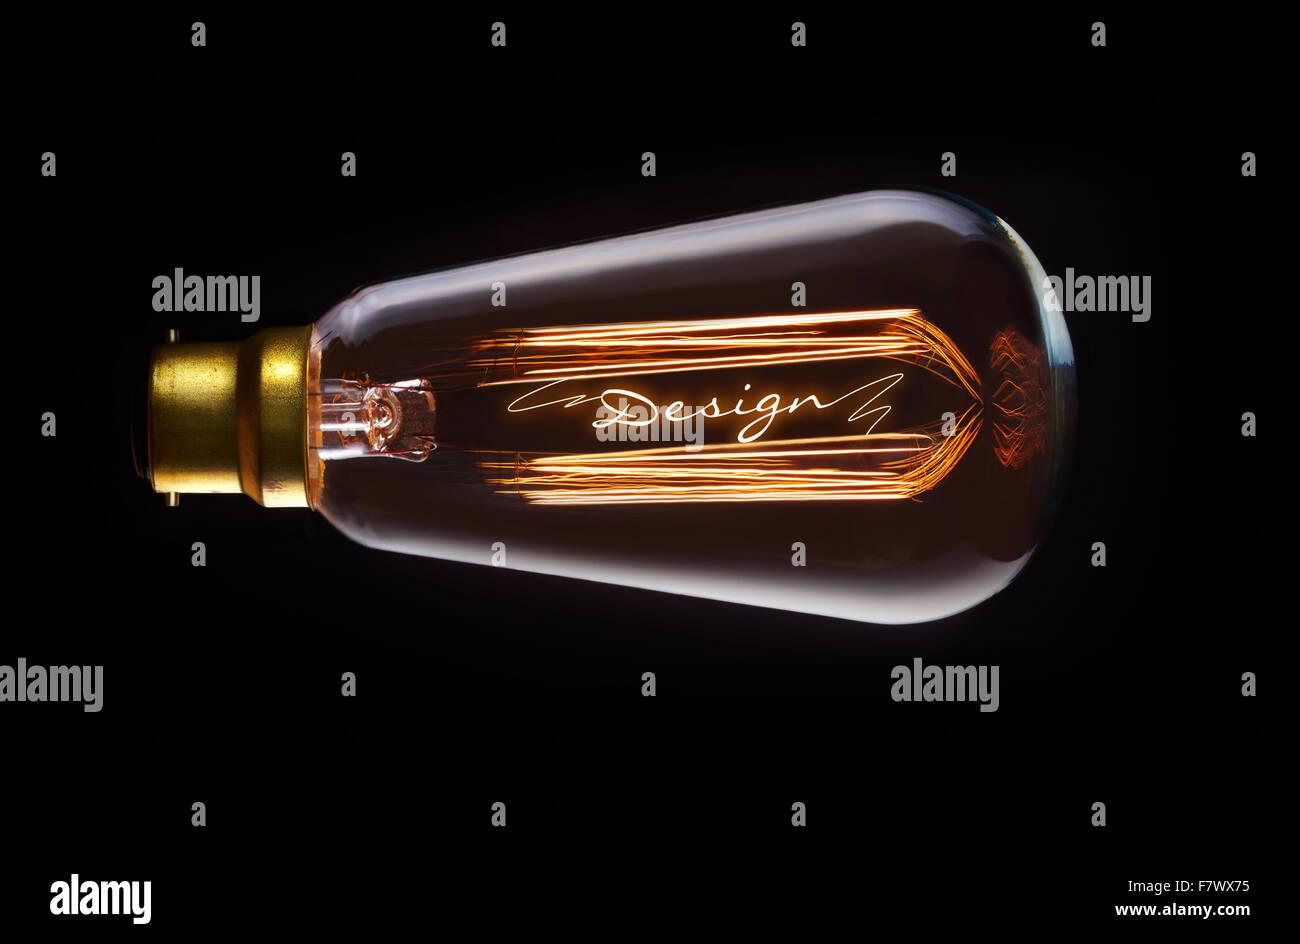 Design concept in a filament lightbulb. - Stock Image